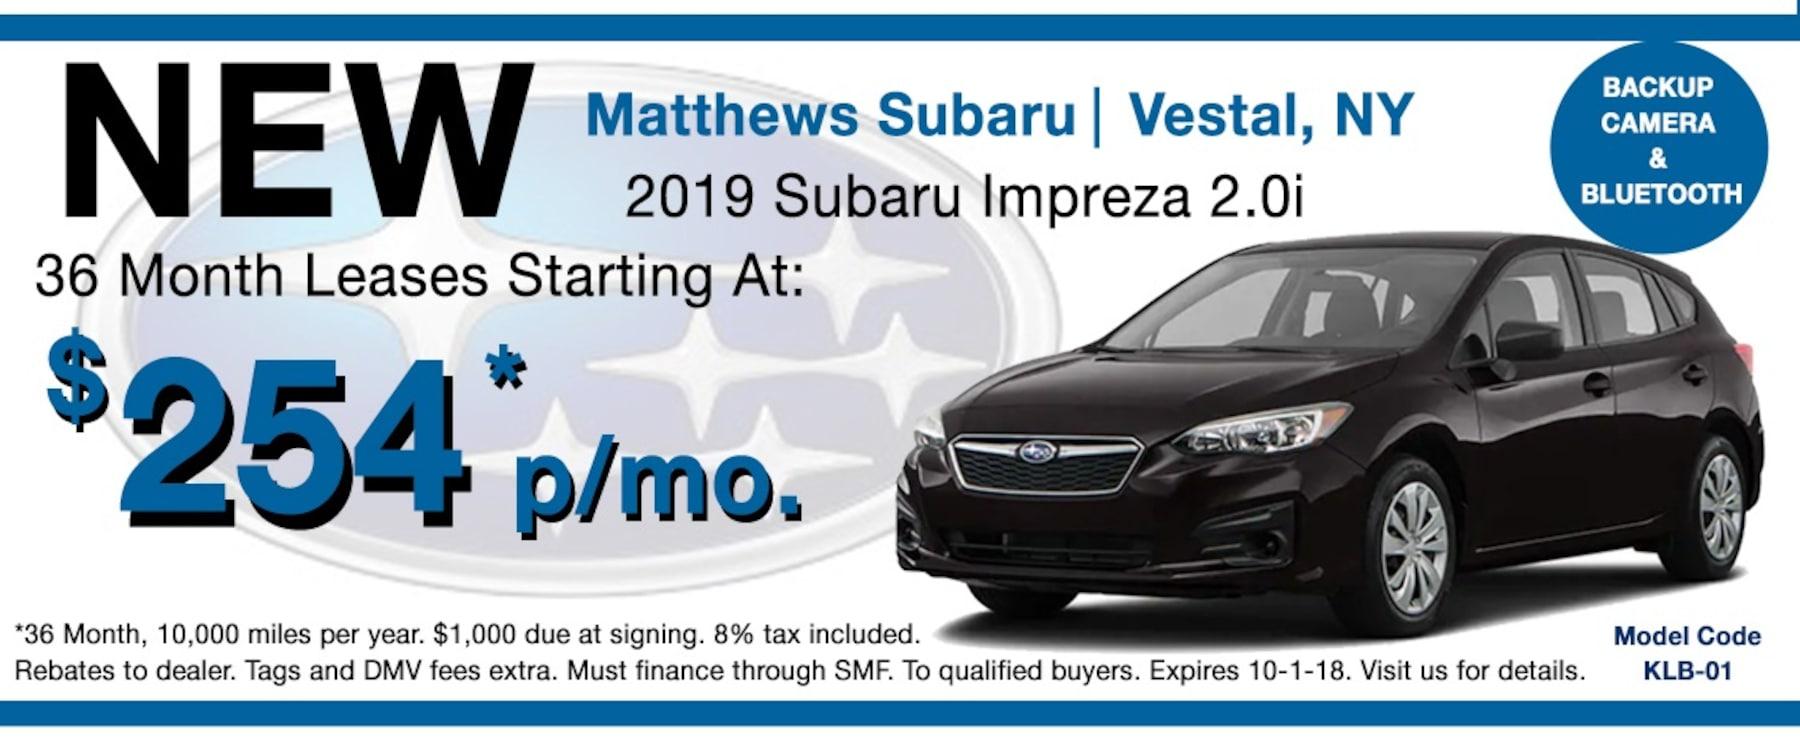 Matthews Subaru - Serving Binghamton & Cortland